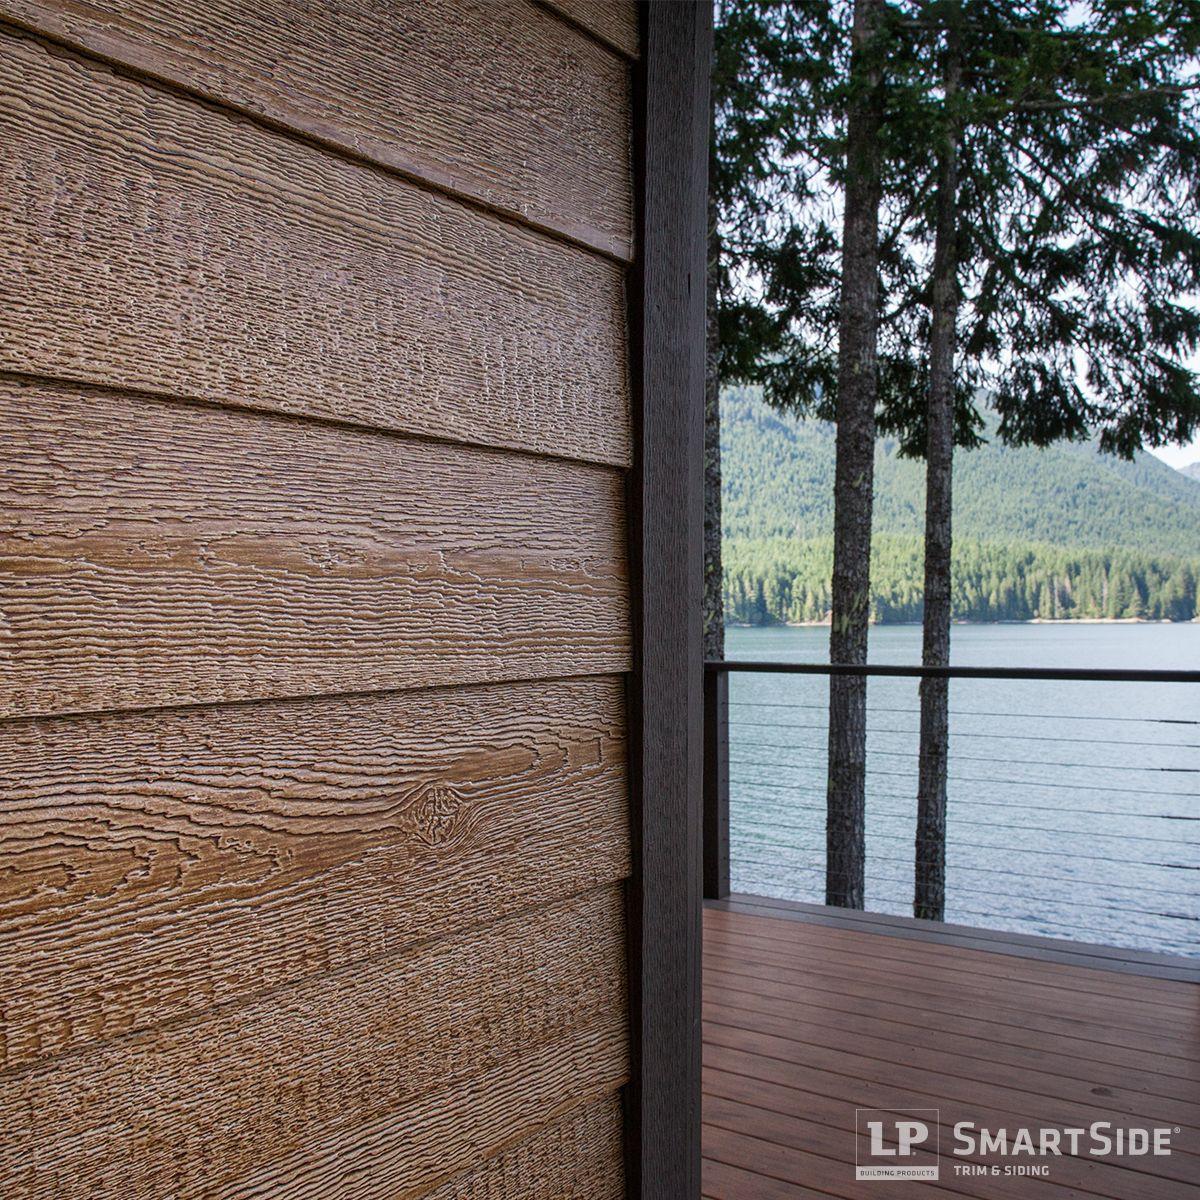 Lp Smartside Siding Extreme Impact Testing Exterior Siding Options Wood Siding Exterior Engineered Wood Siding